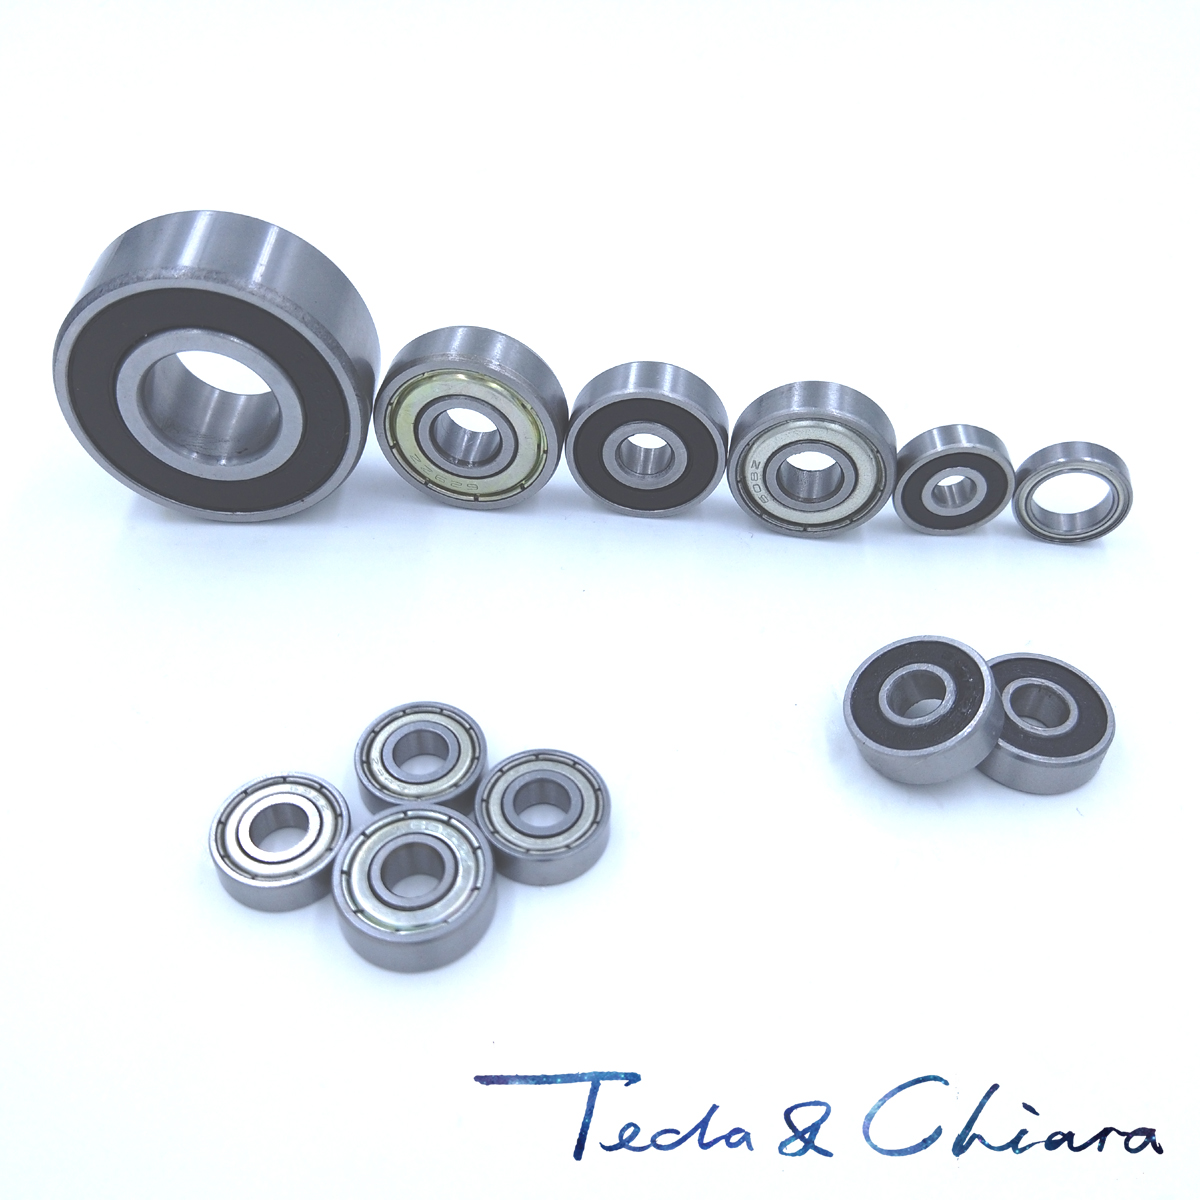 625 625ZZ 625RS 625-2Z 625Z 625-2RS ZZ RS RZ 2RZ Deep Groove Ball Bearings 5 x 16 x 5mm